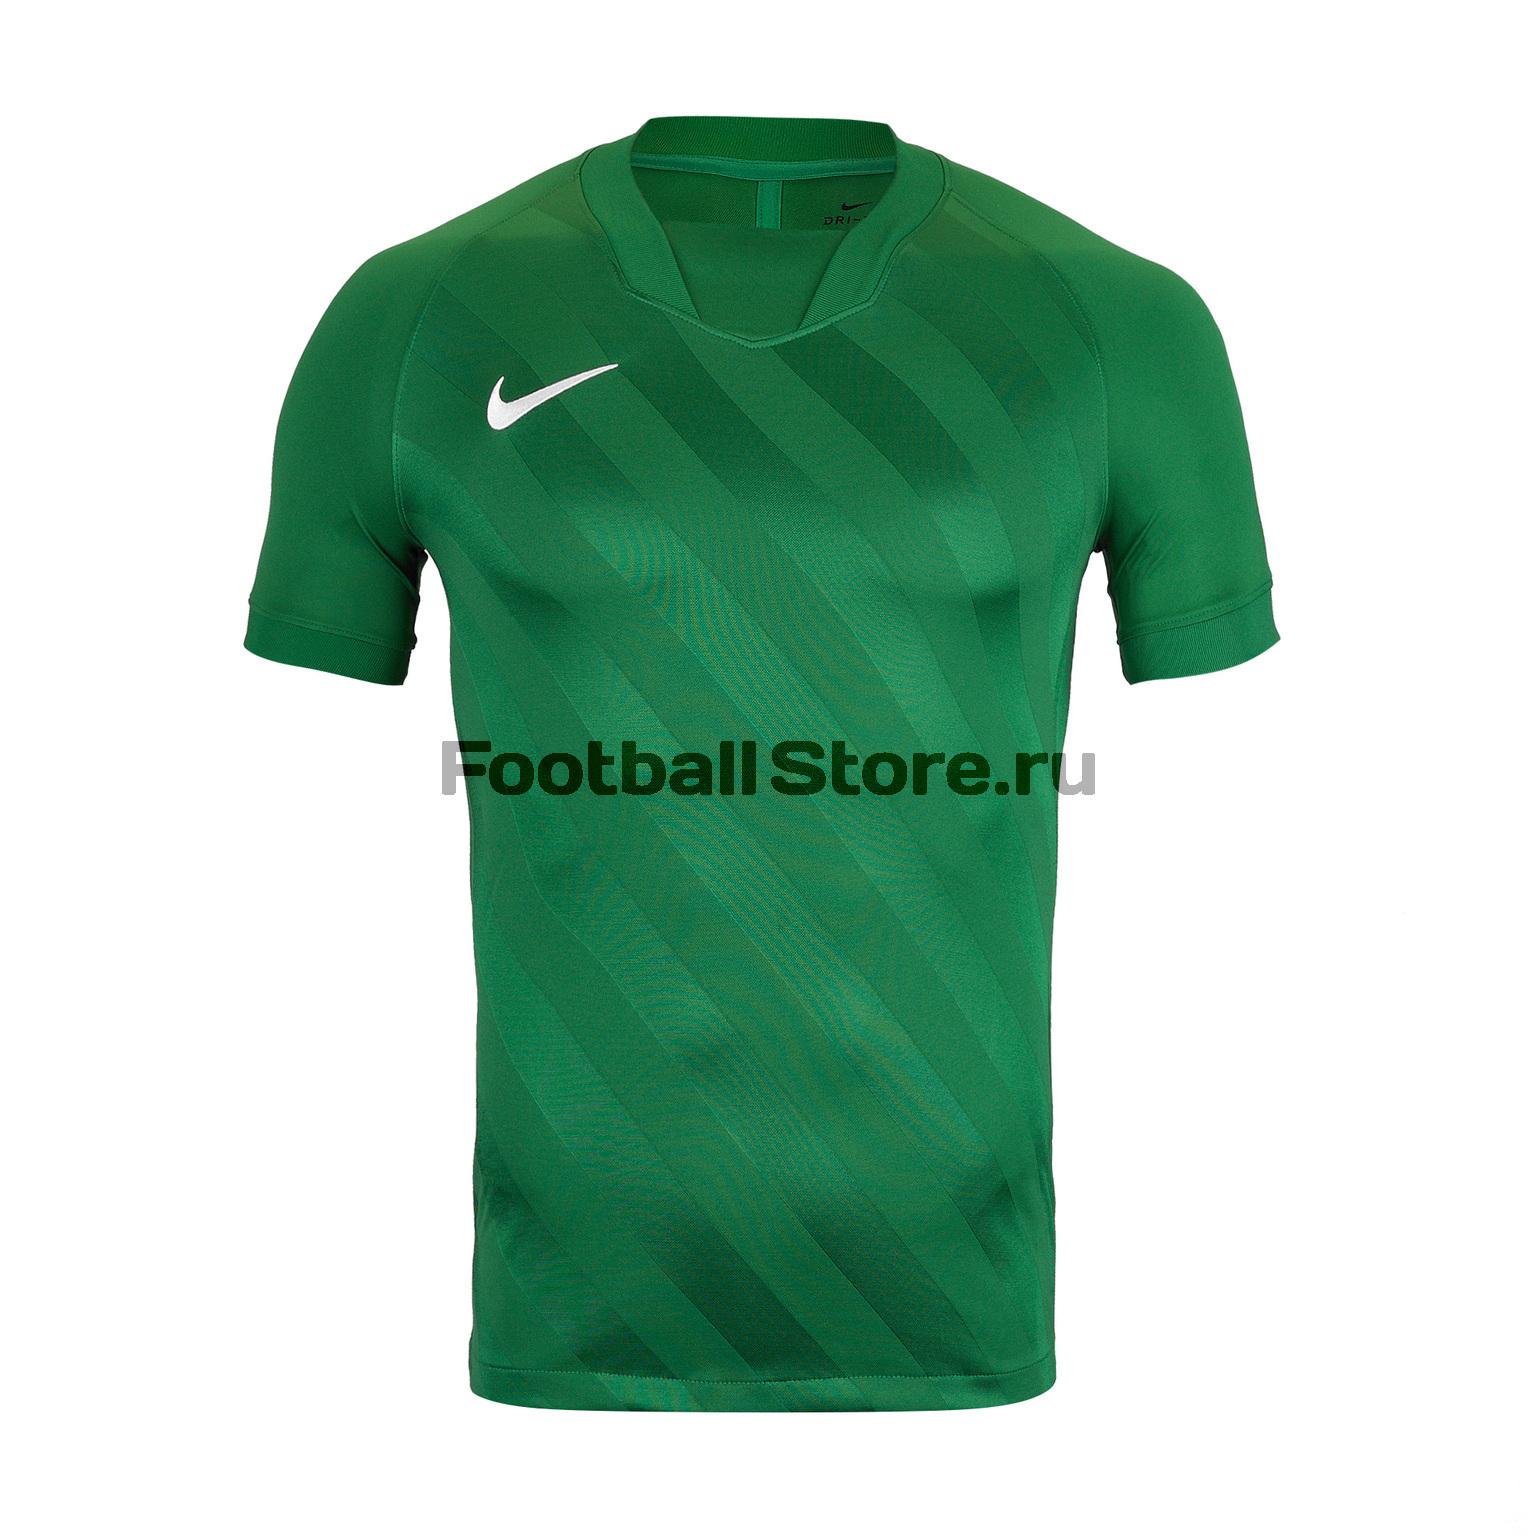 Футболка игровая Nike Dry Challenge III BV6703-302 цена и фото